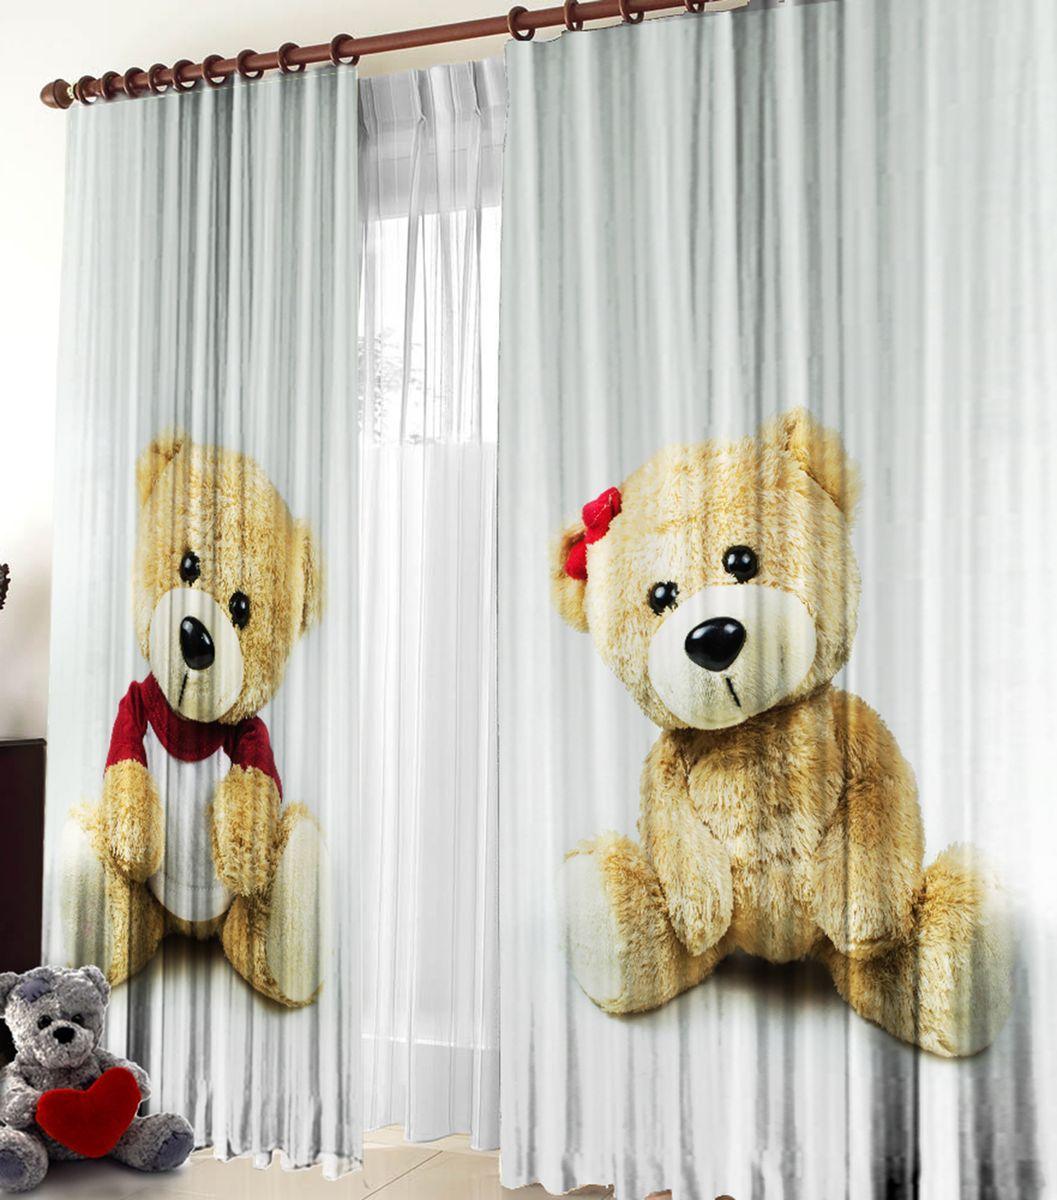 Комплект фотоштор Zlata Korunka Медвежата, на ленте, высота 270 см